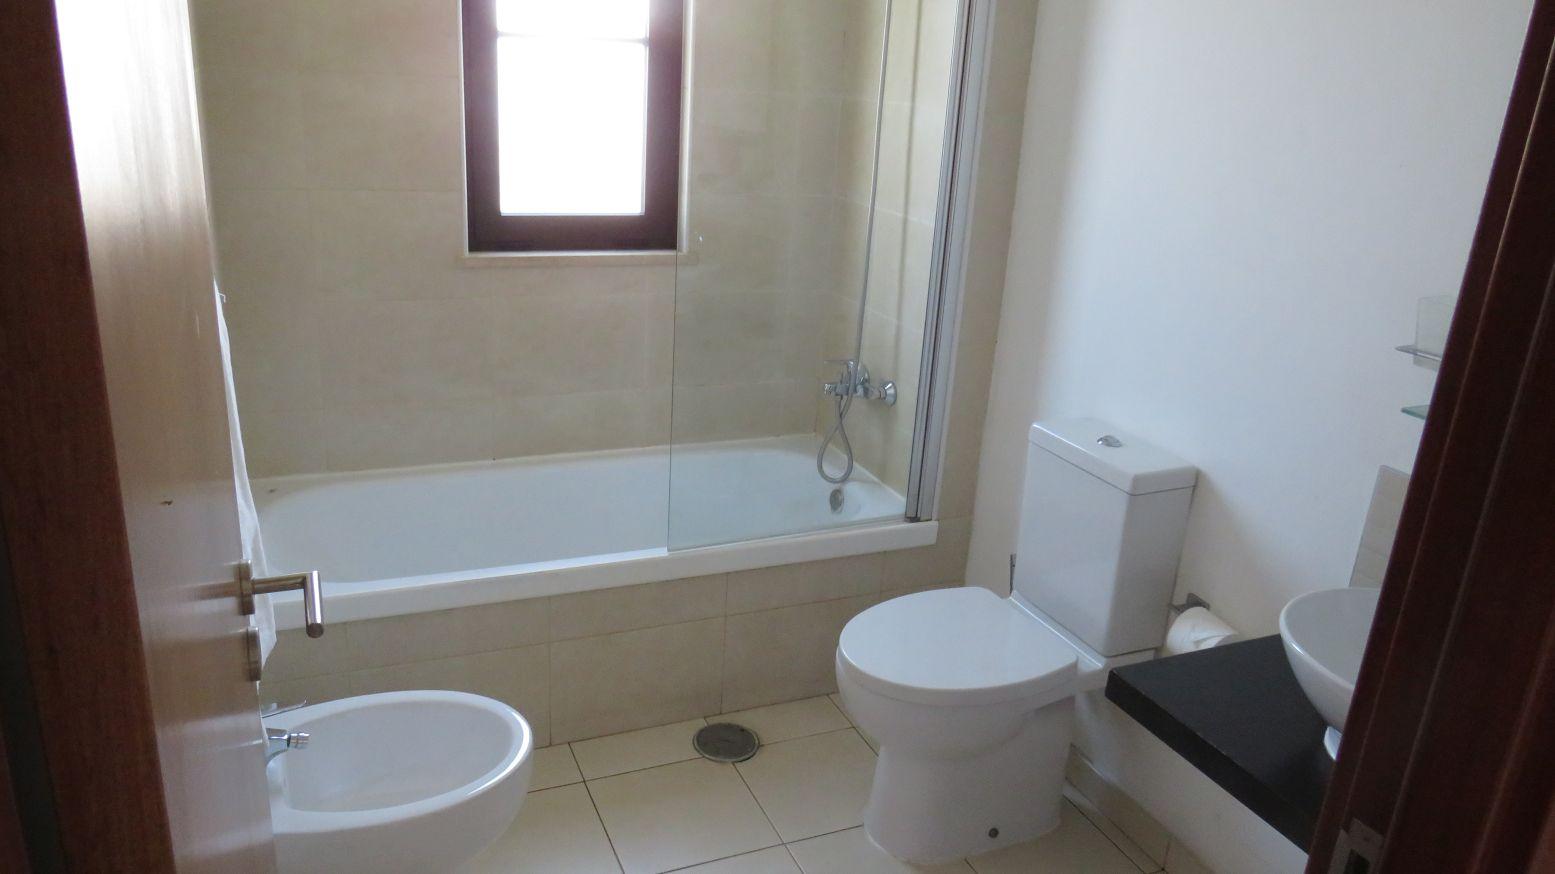 Bathroom Tortuga Beach Resort Cape Verde